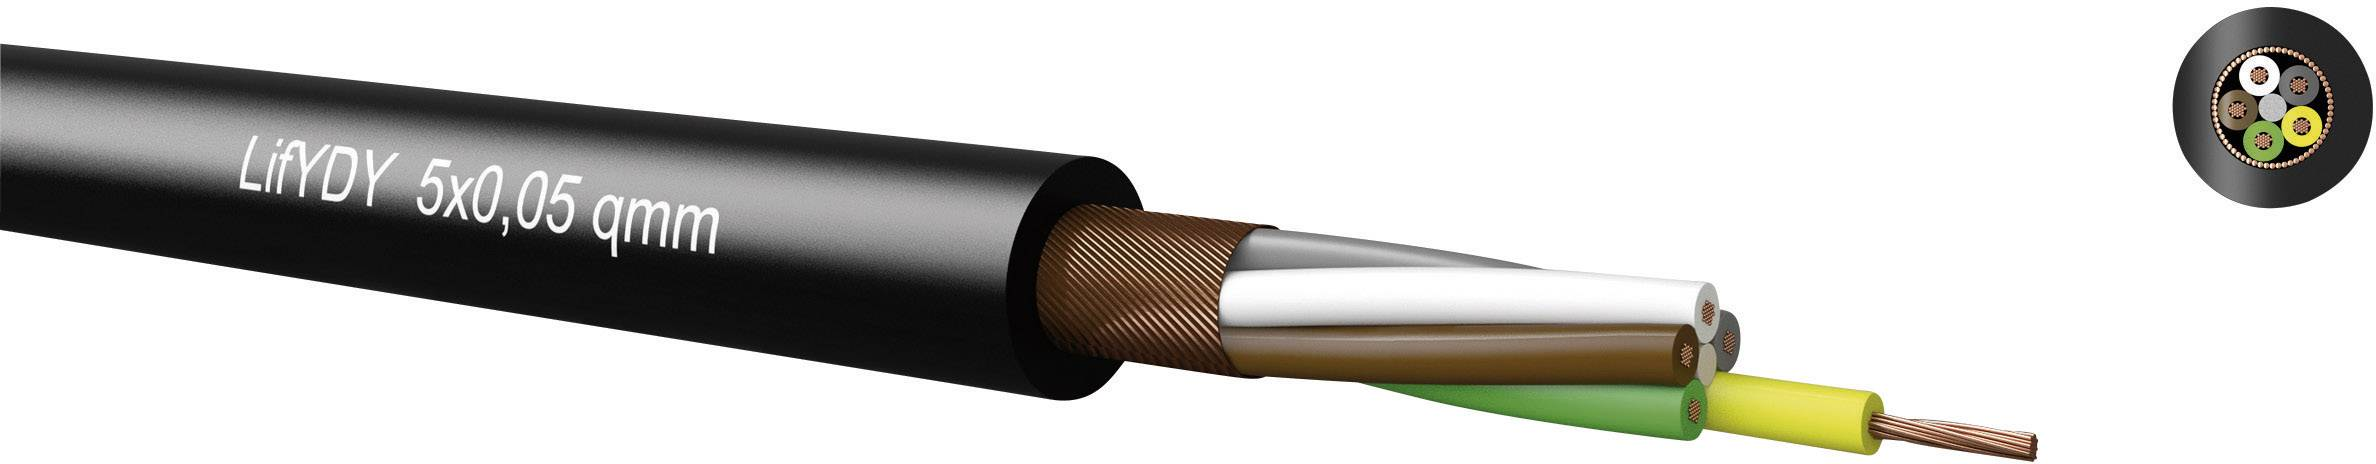 Riadiaci kábel Kabeltronik LifYDY 340400500, 4 x 0.05 mm², vonkajší Ø 3 mm, 100 V, metrový tovar, čierna